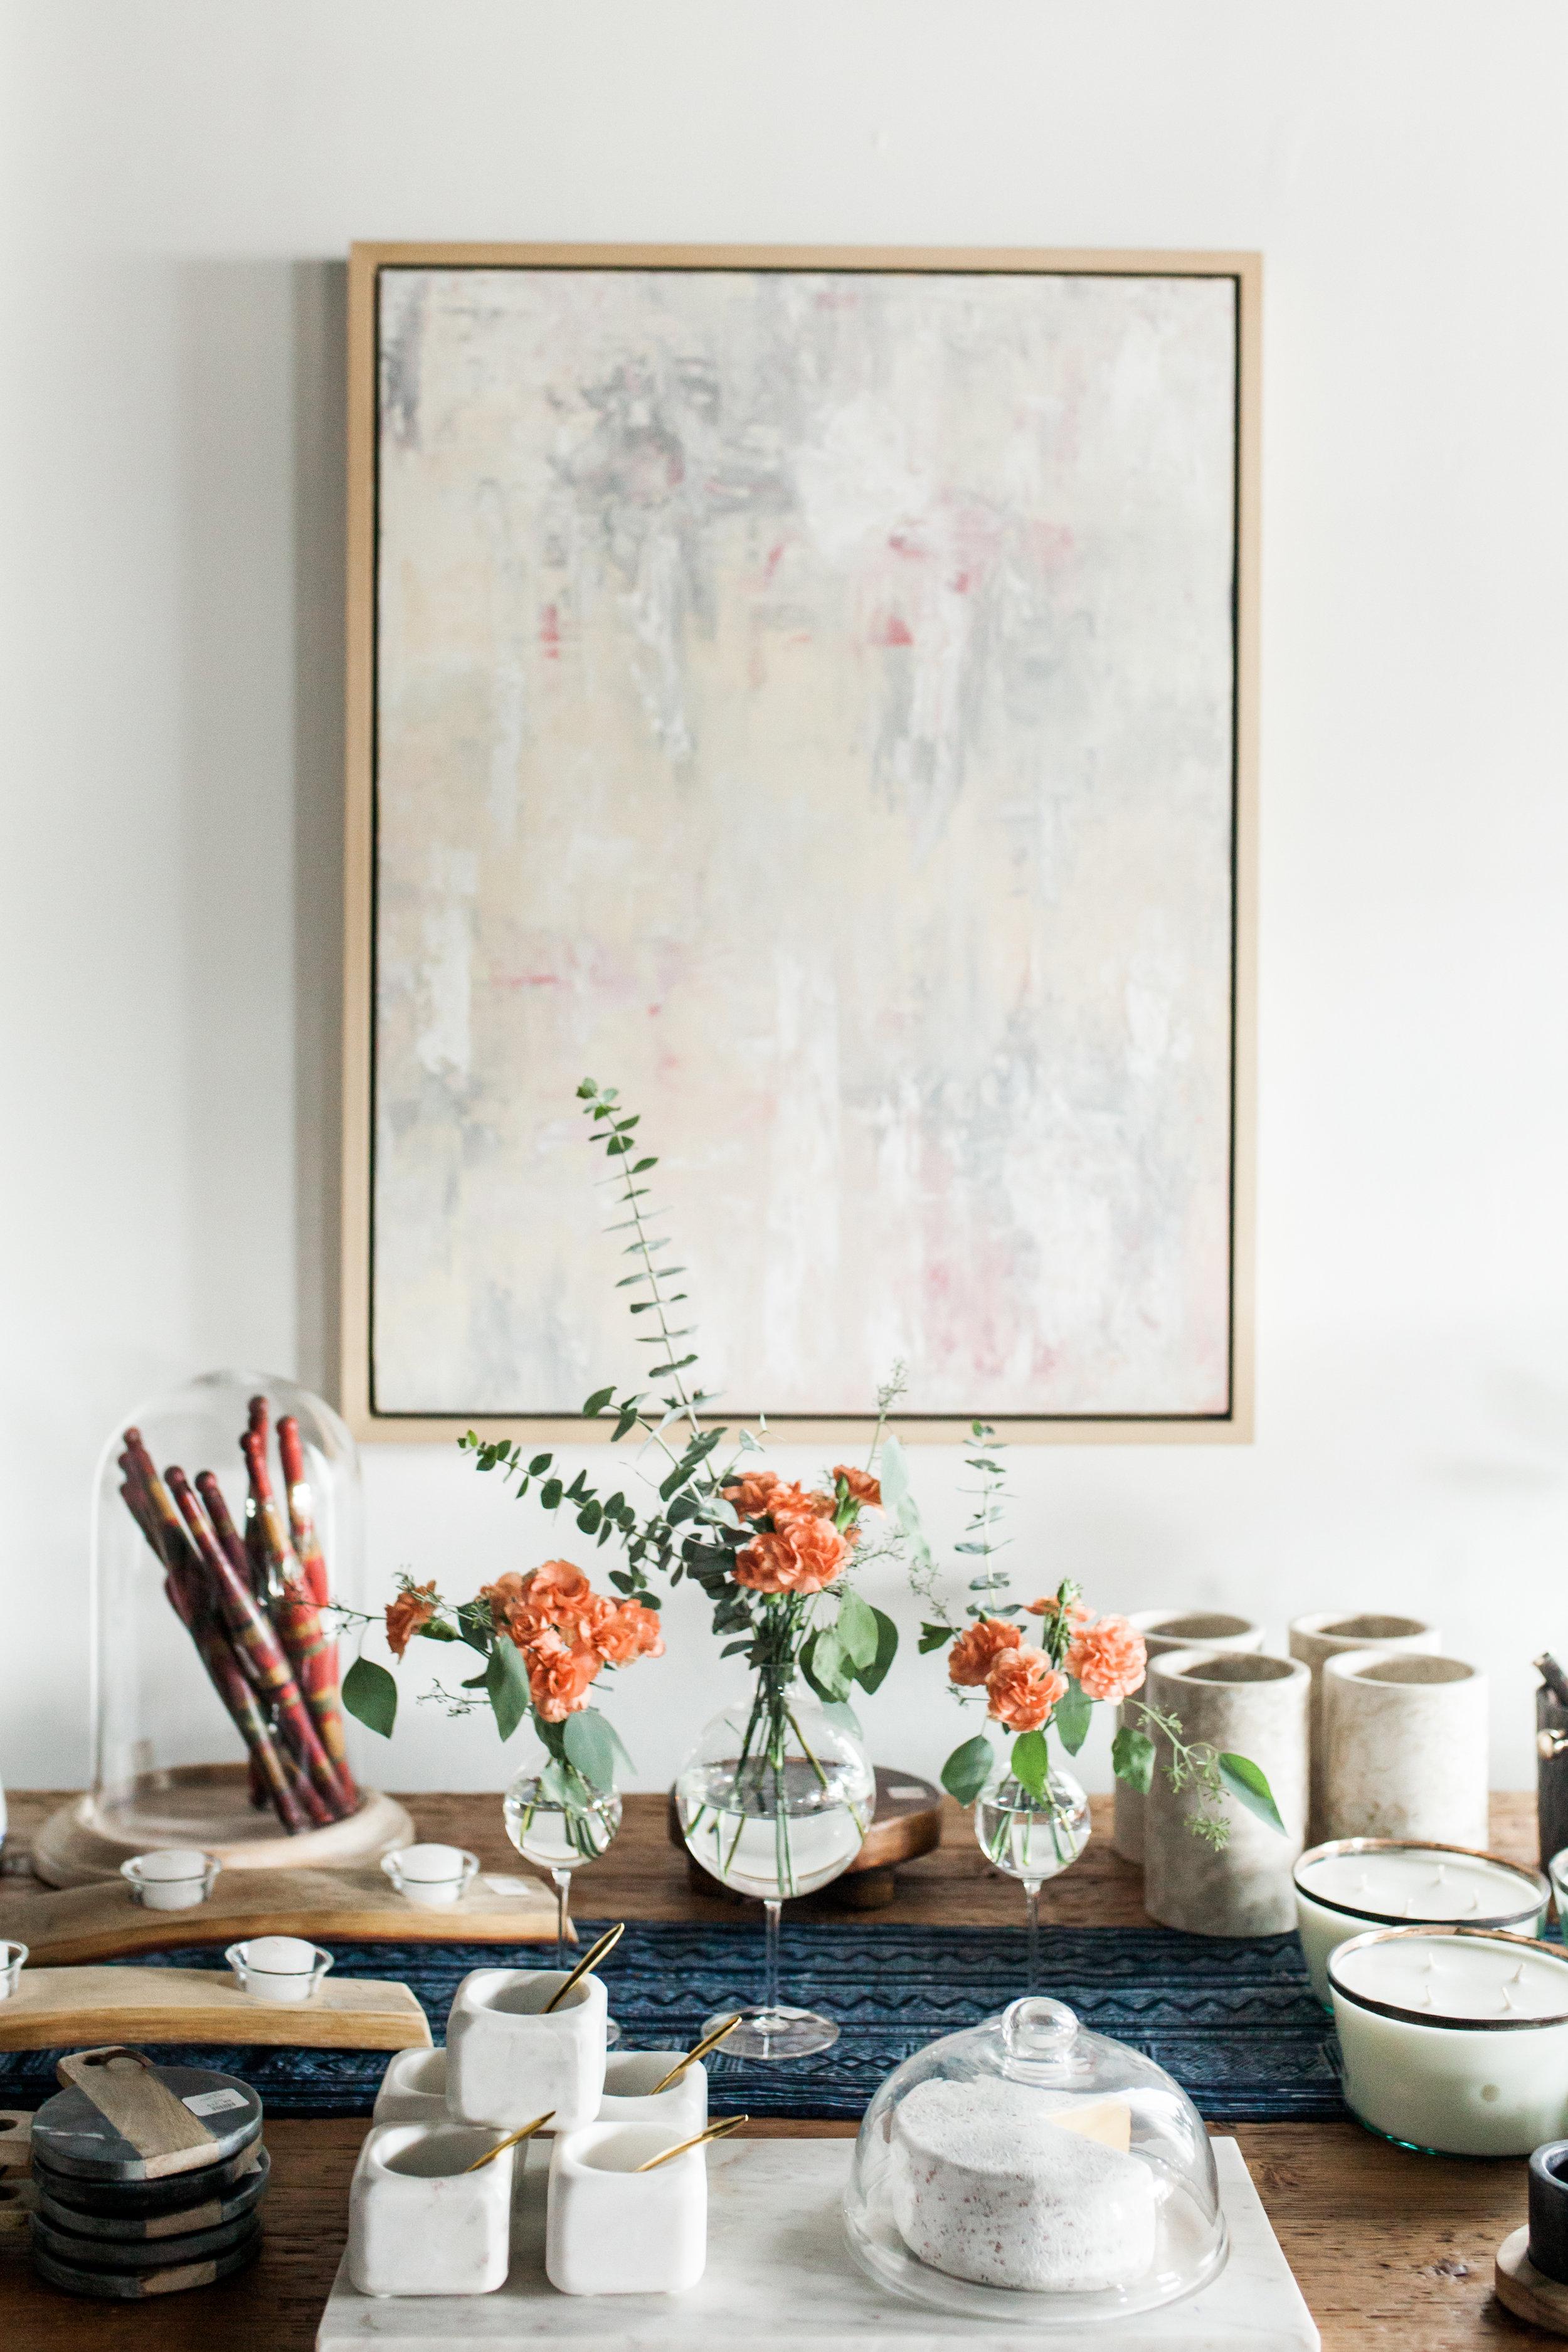 art decor and vase.jpg